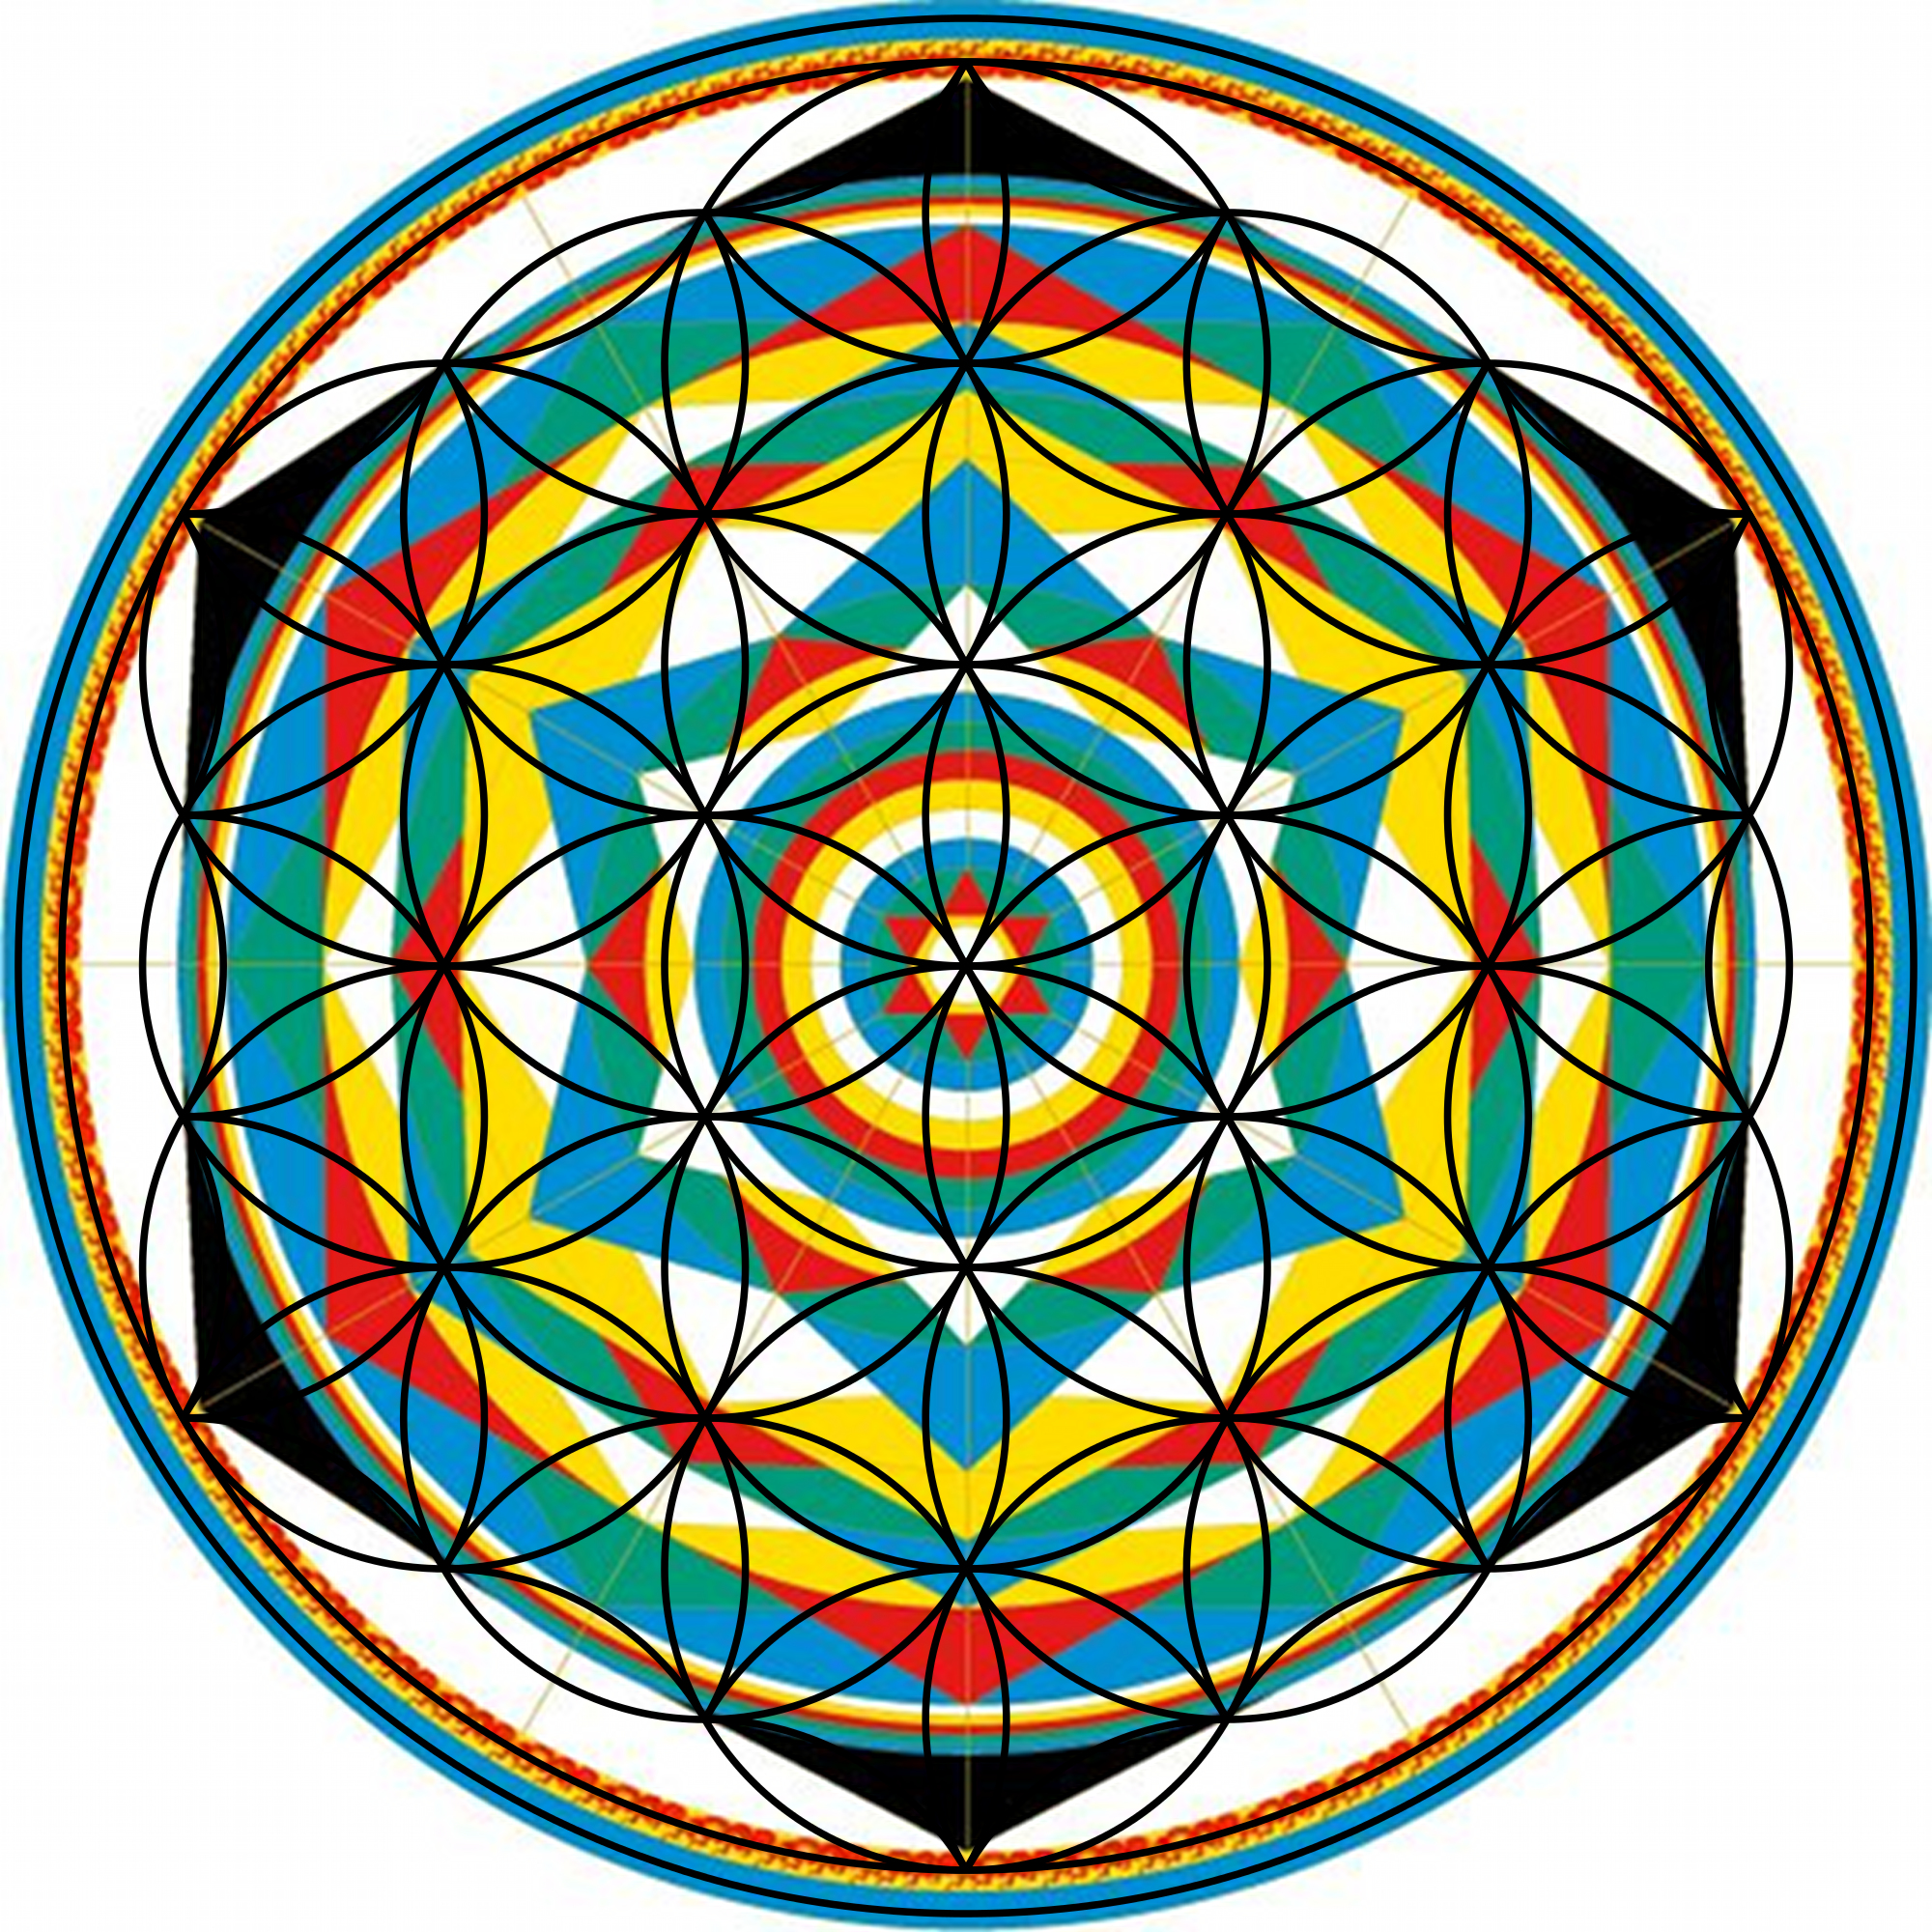 Bloem van Leven Universele Mandala Plukrijp